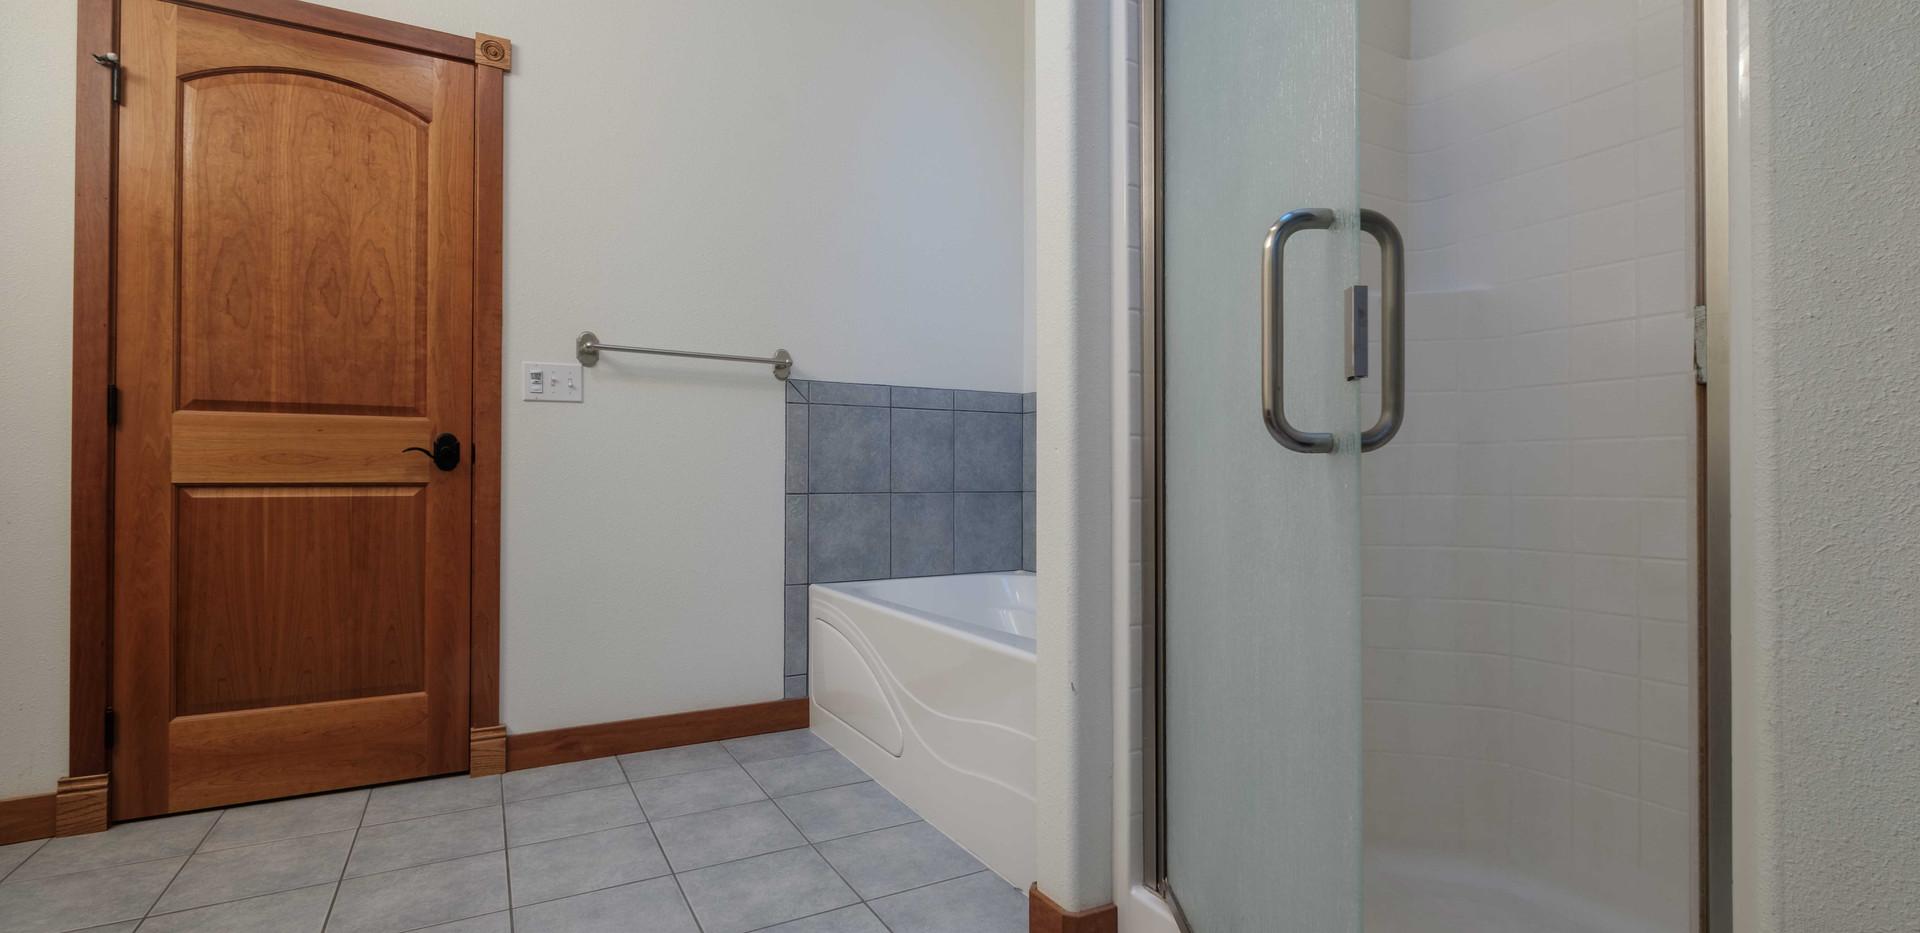 House_Mst_Bath_03.jpg